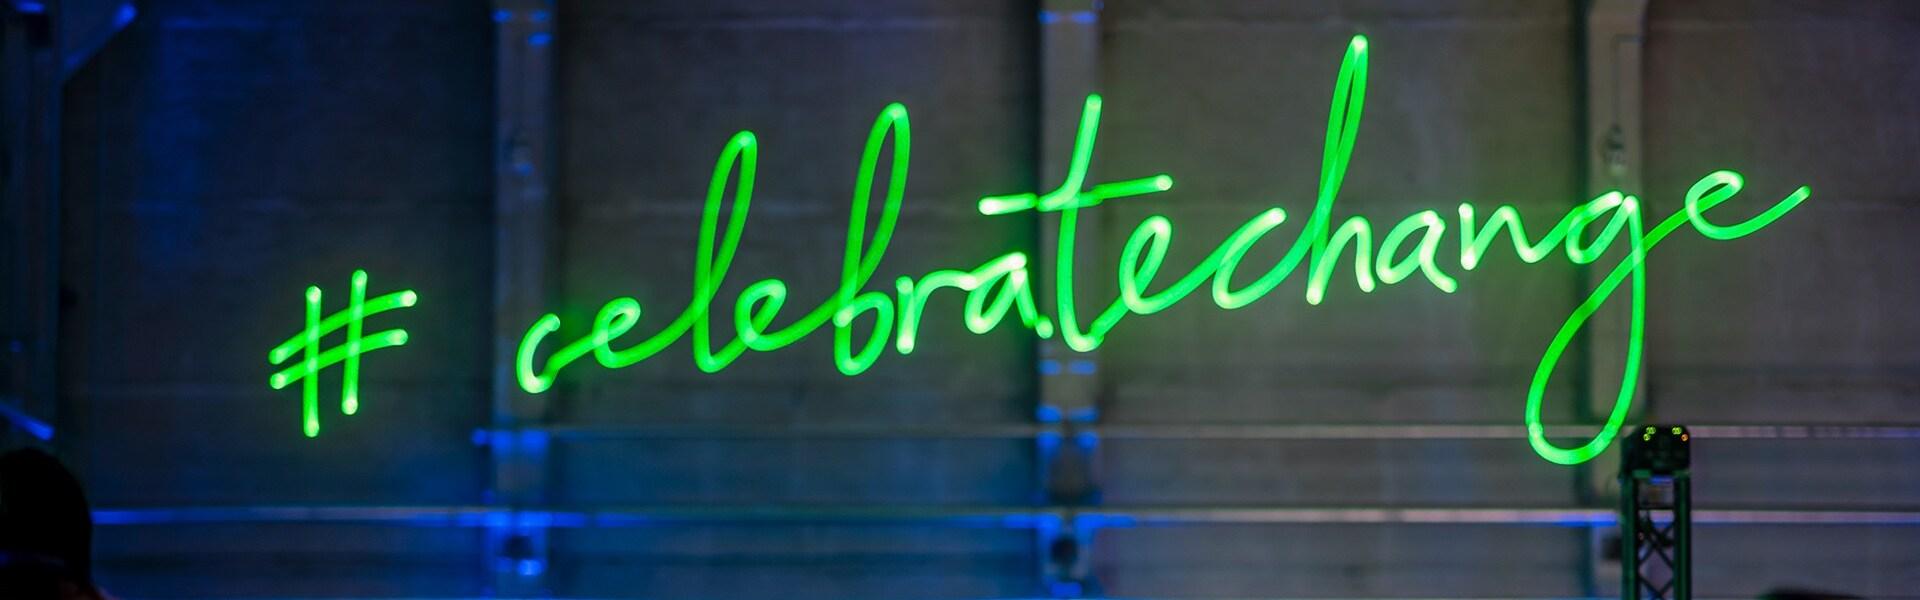 #celebratechange